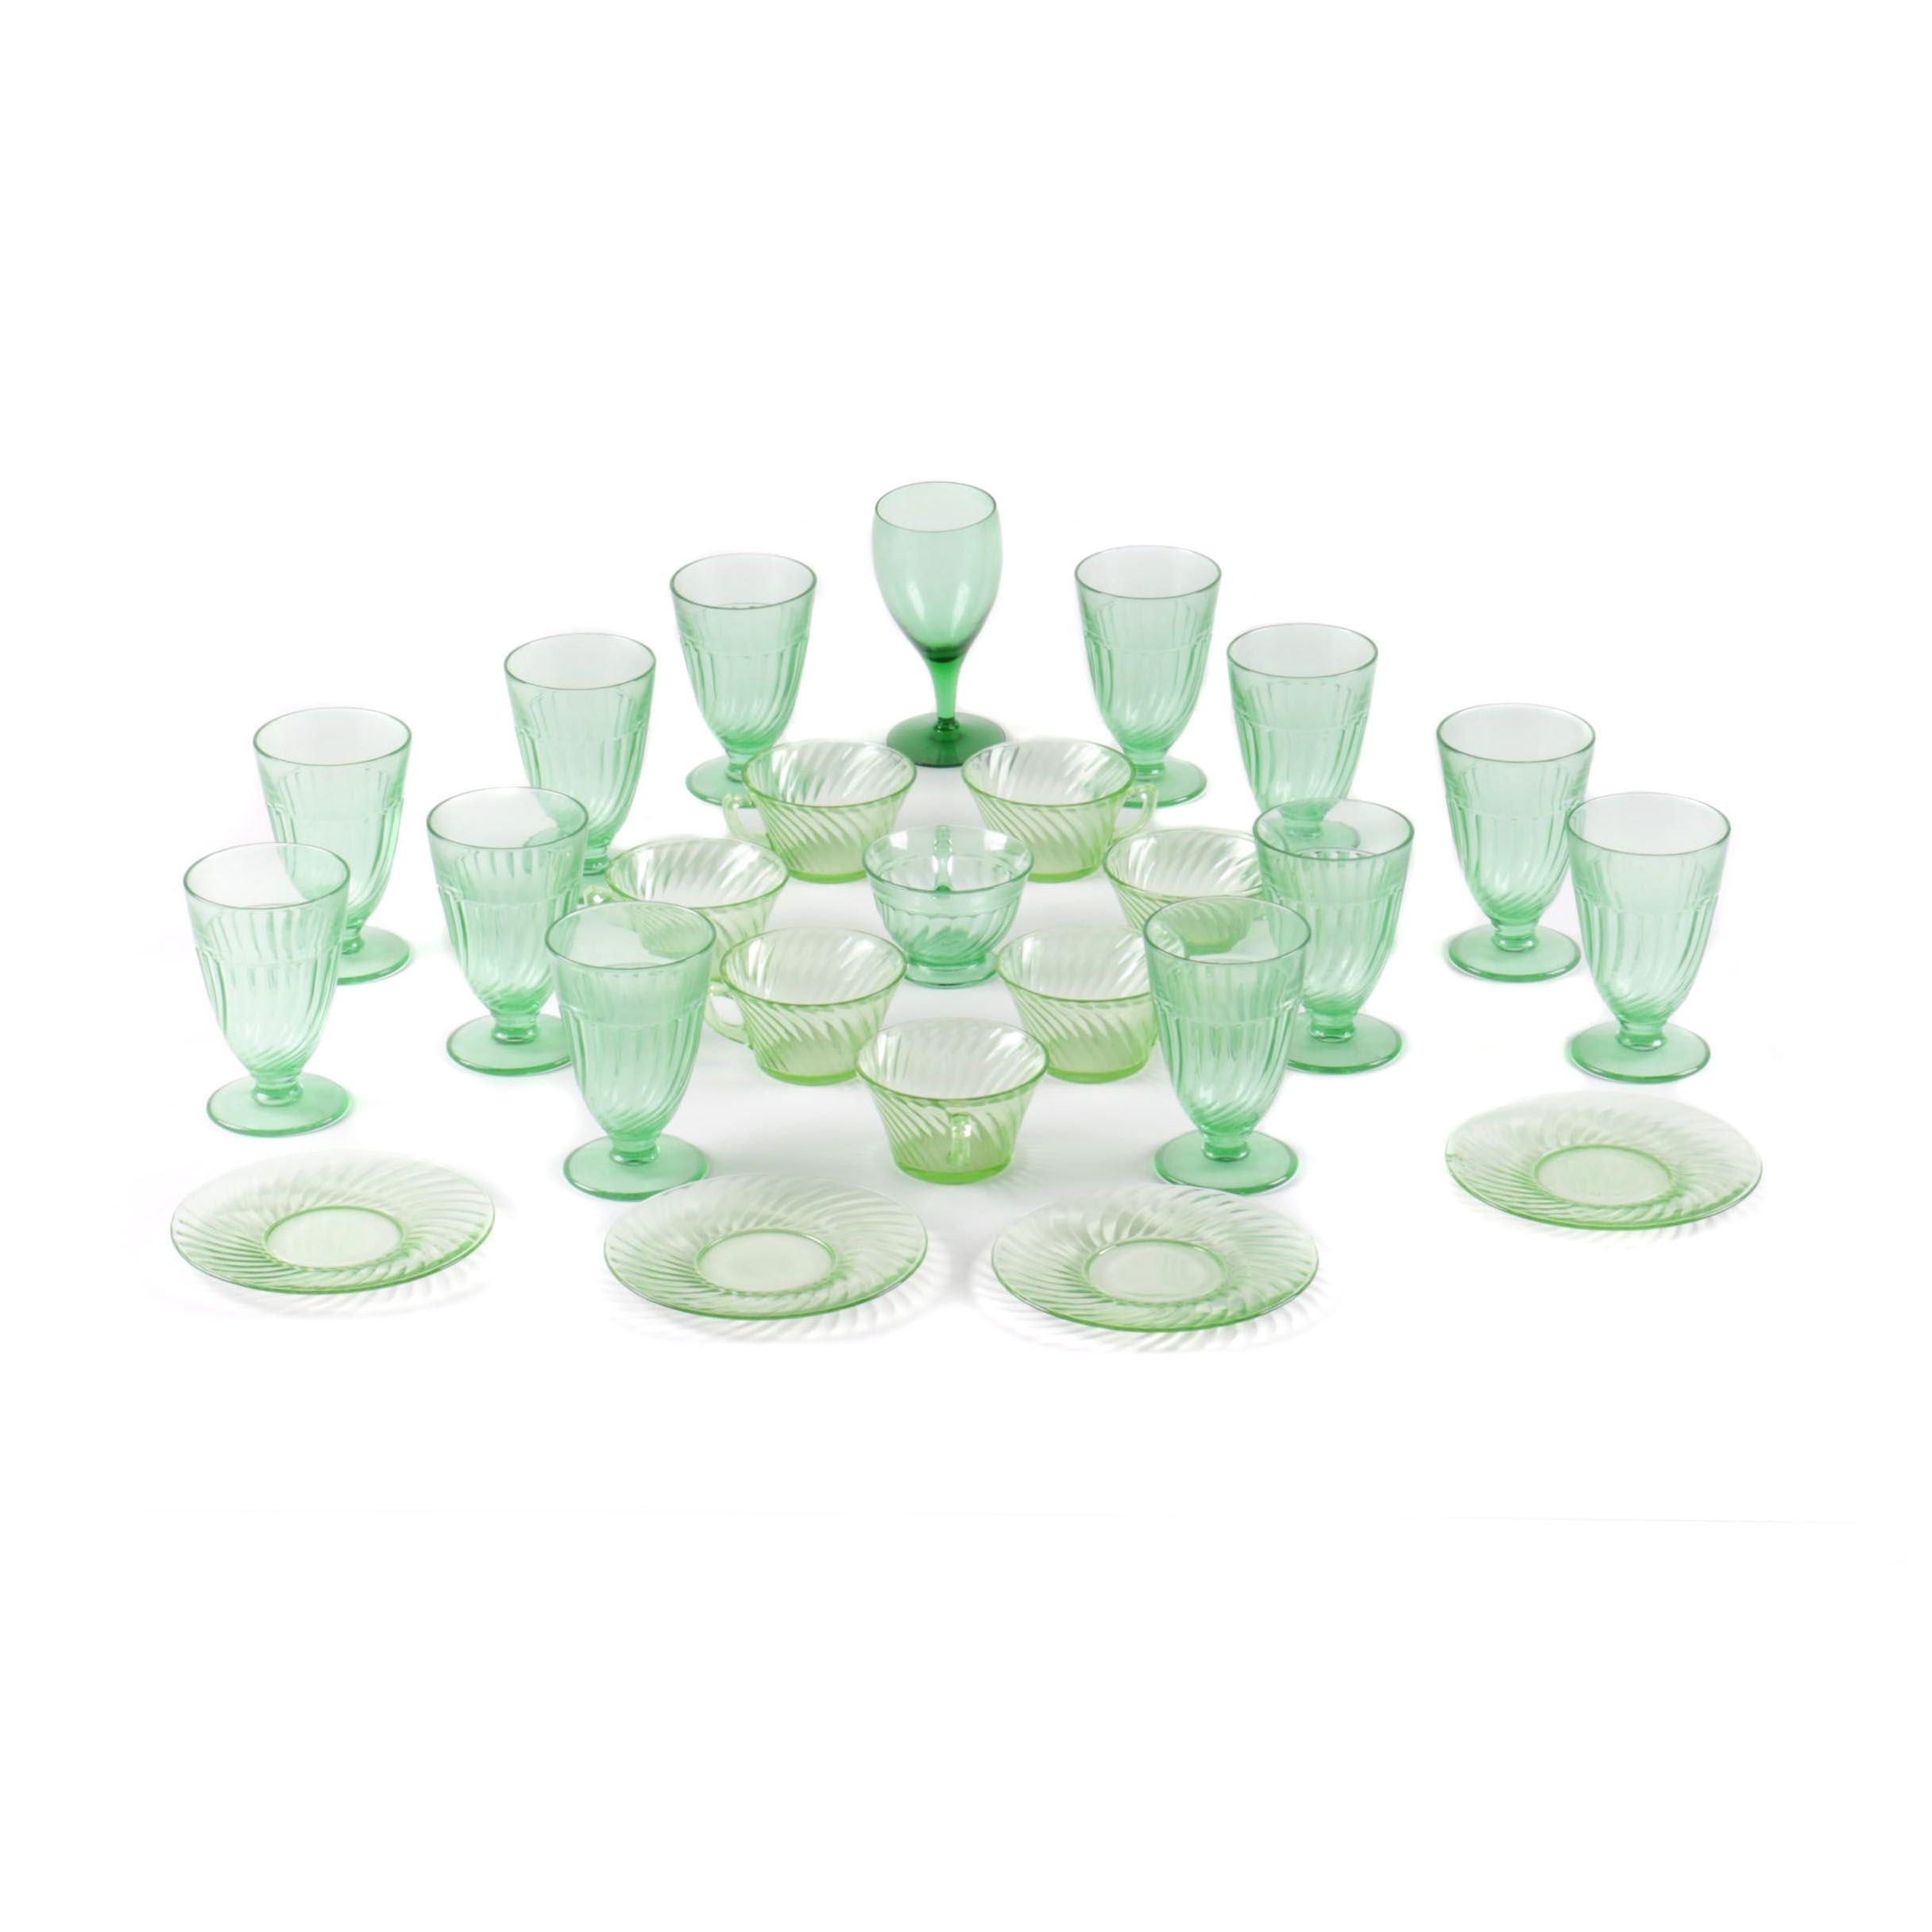 Depression and Vaseline Glassware